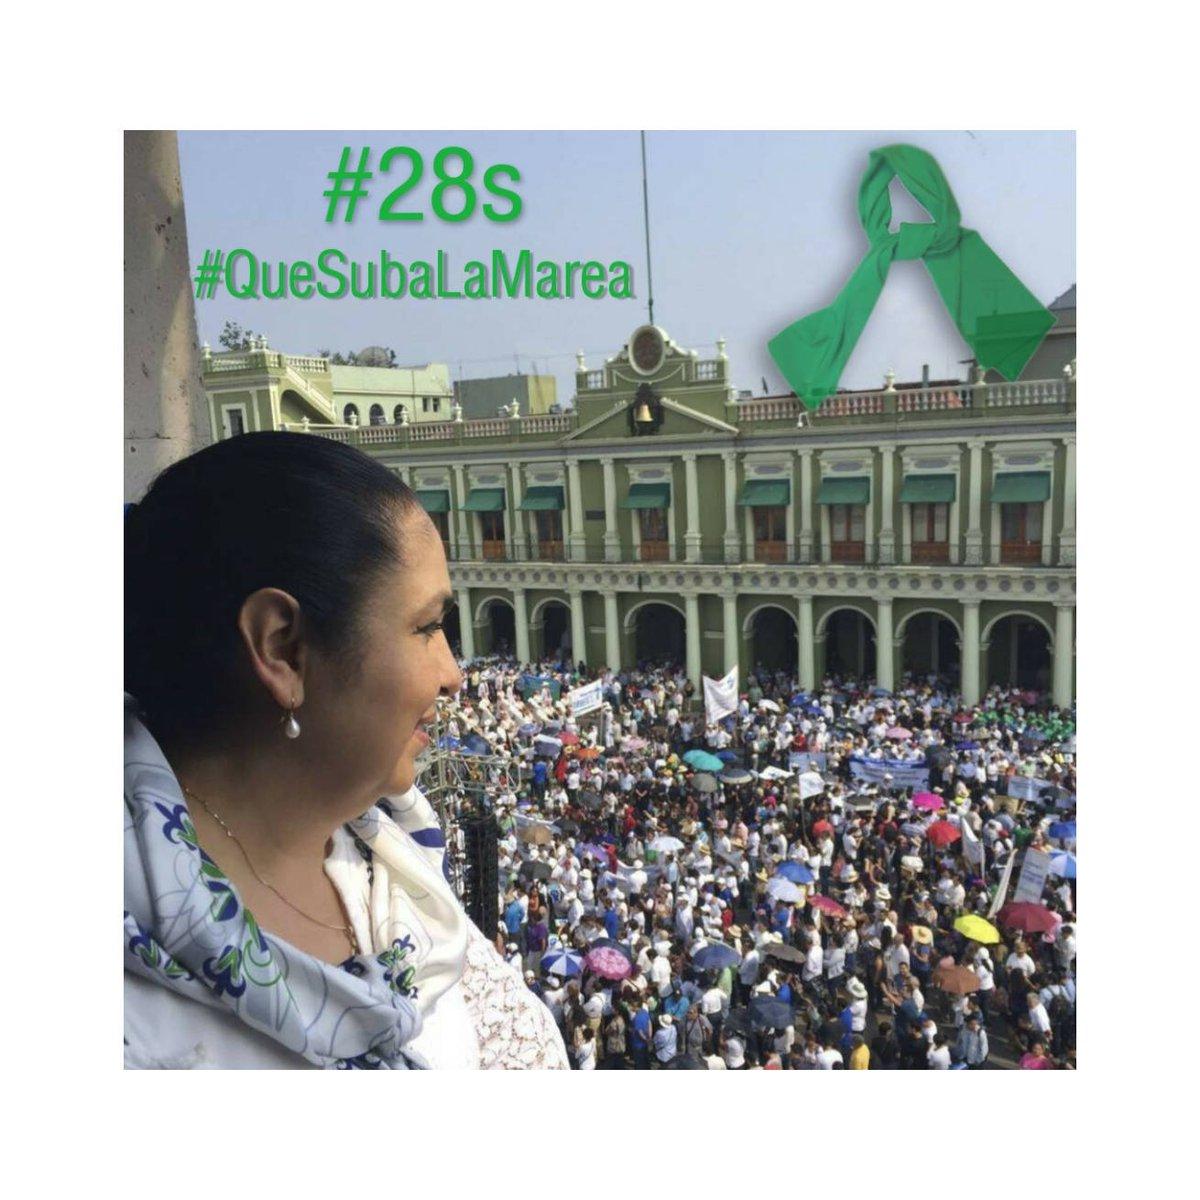 #NuevaFotoDePerfil #28s #QueSubaLaMarea https://t.co/x86S0mpfuh